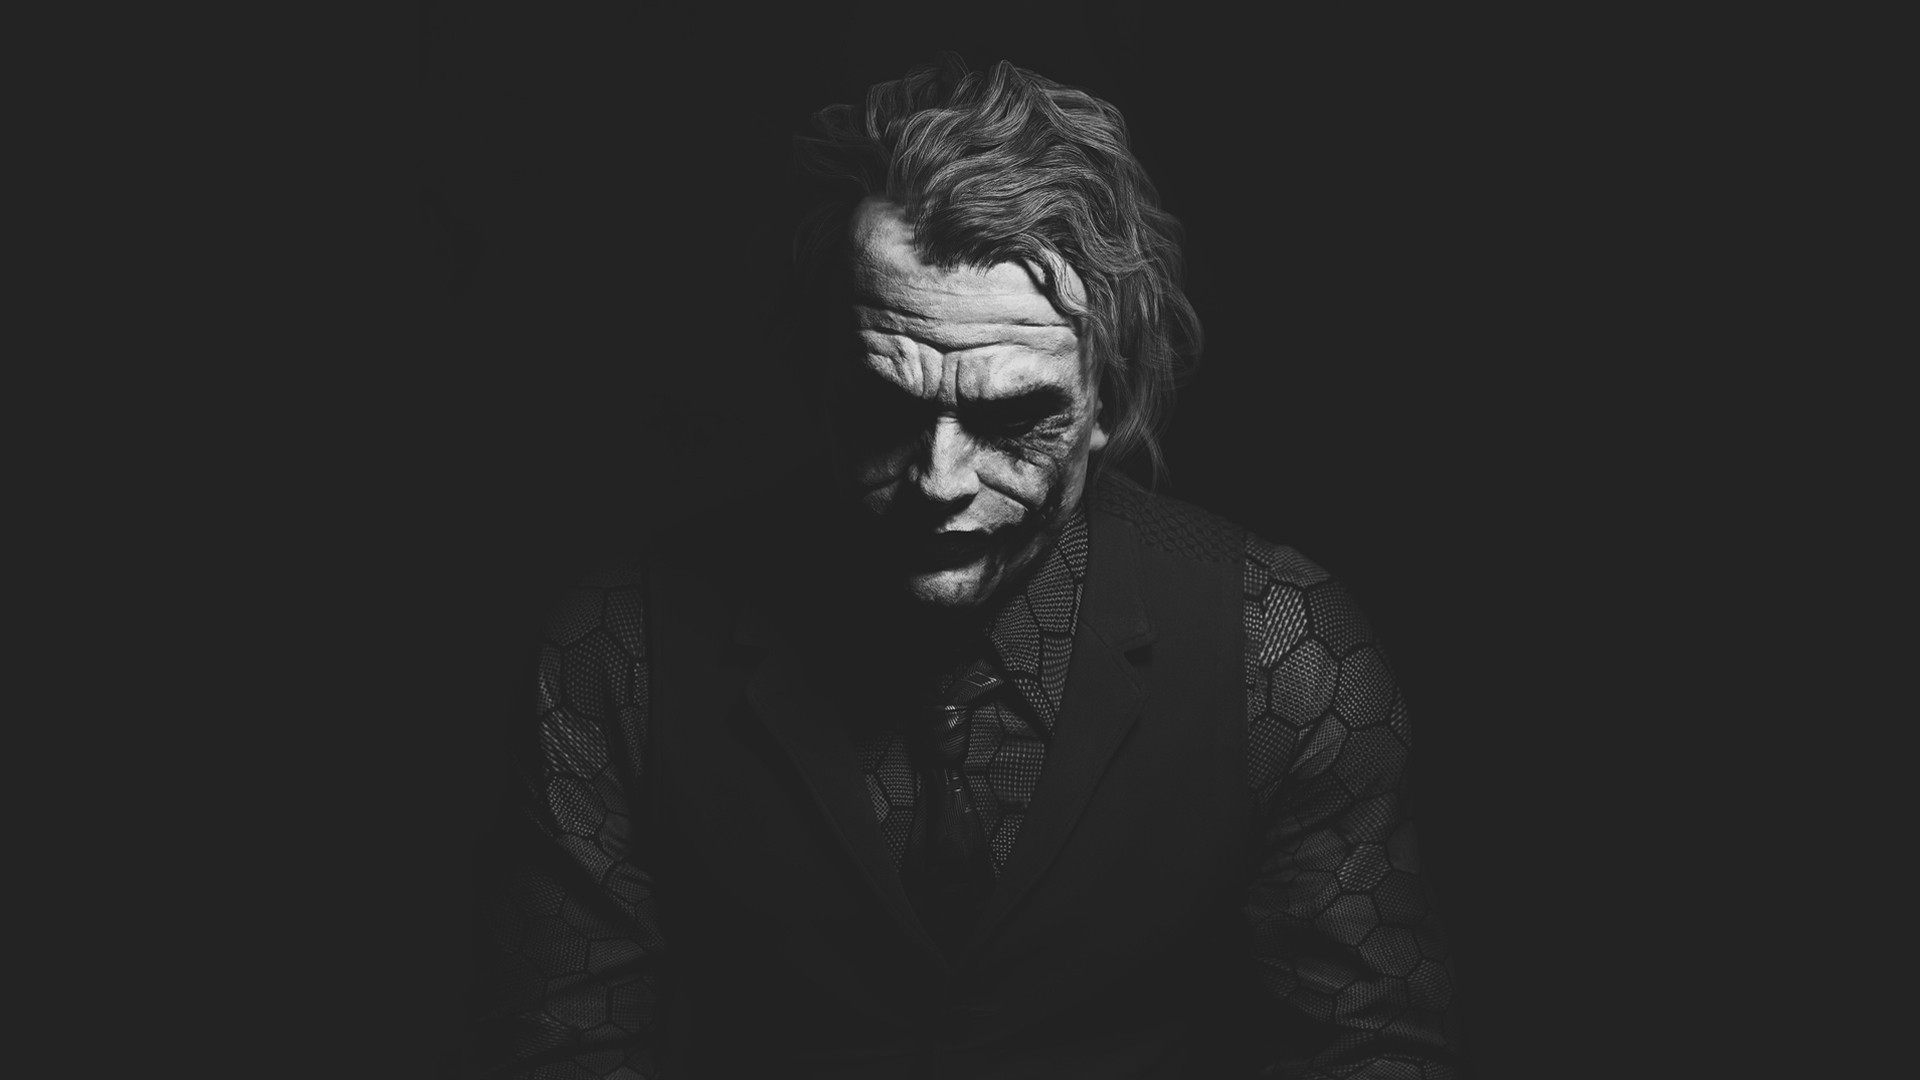 Joker 2 hd movies 4k wallpapers images backgrounds for Joker wallpaper 4k